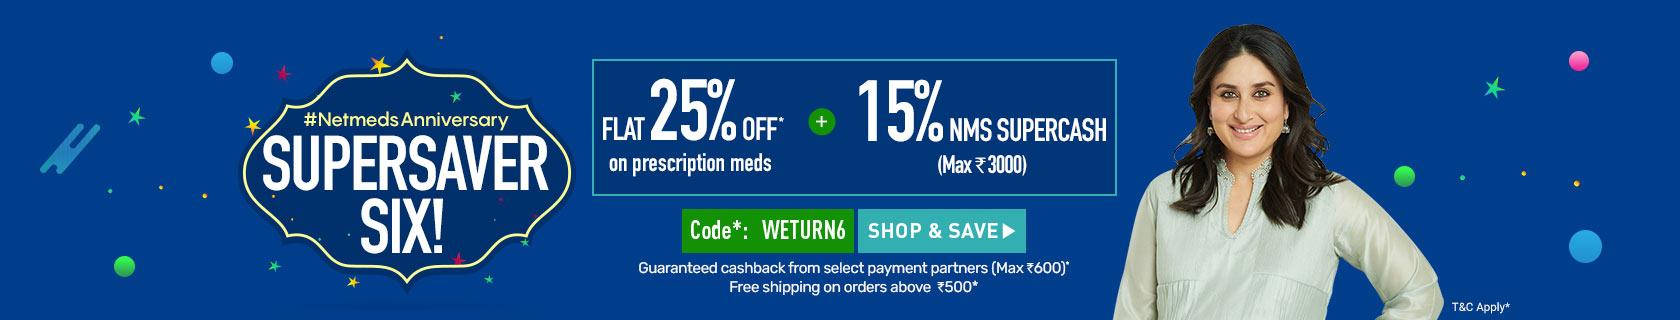 FLAT 25% OFF on Medicines + 15% NMS SuperCash + Cashback